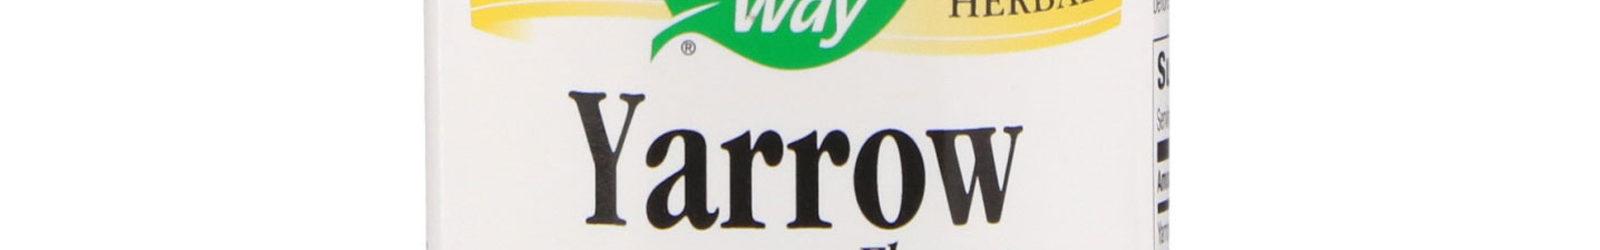 yarrow